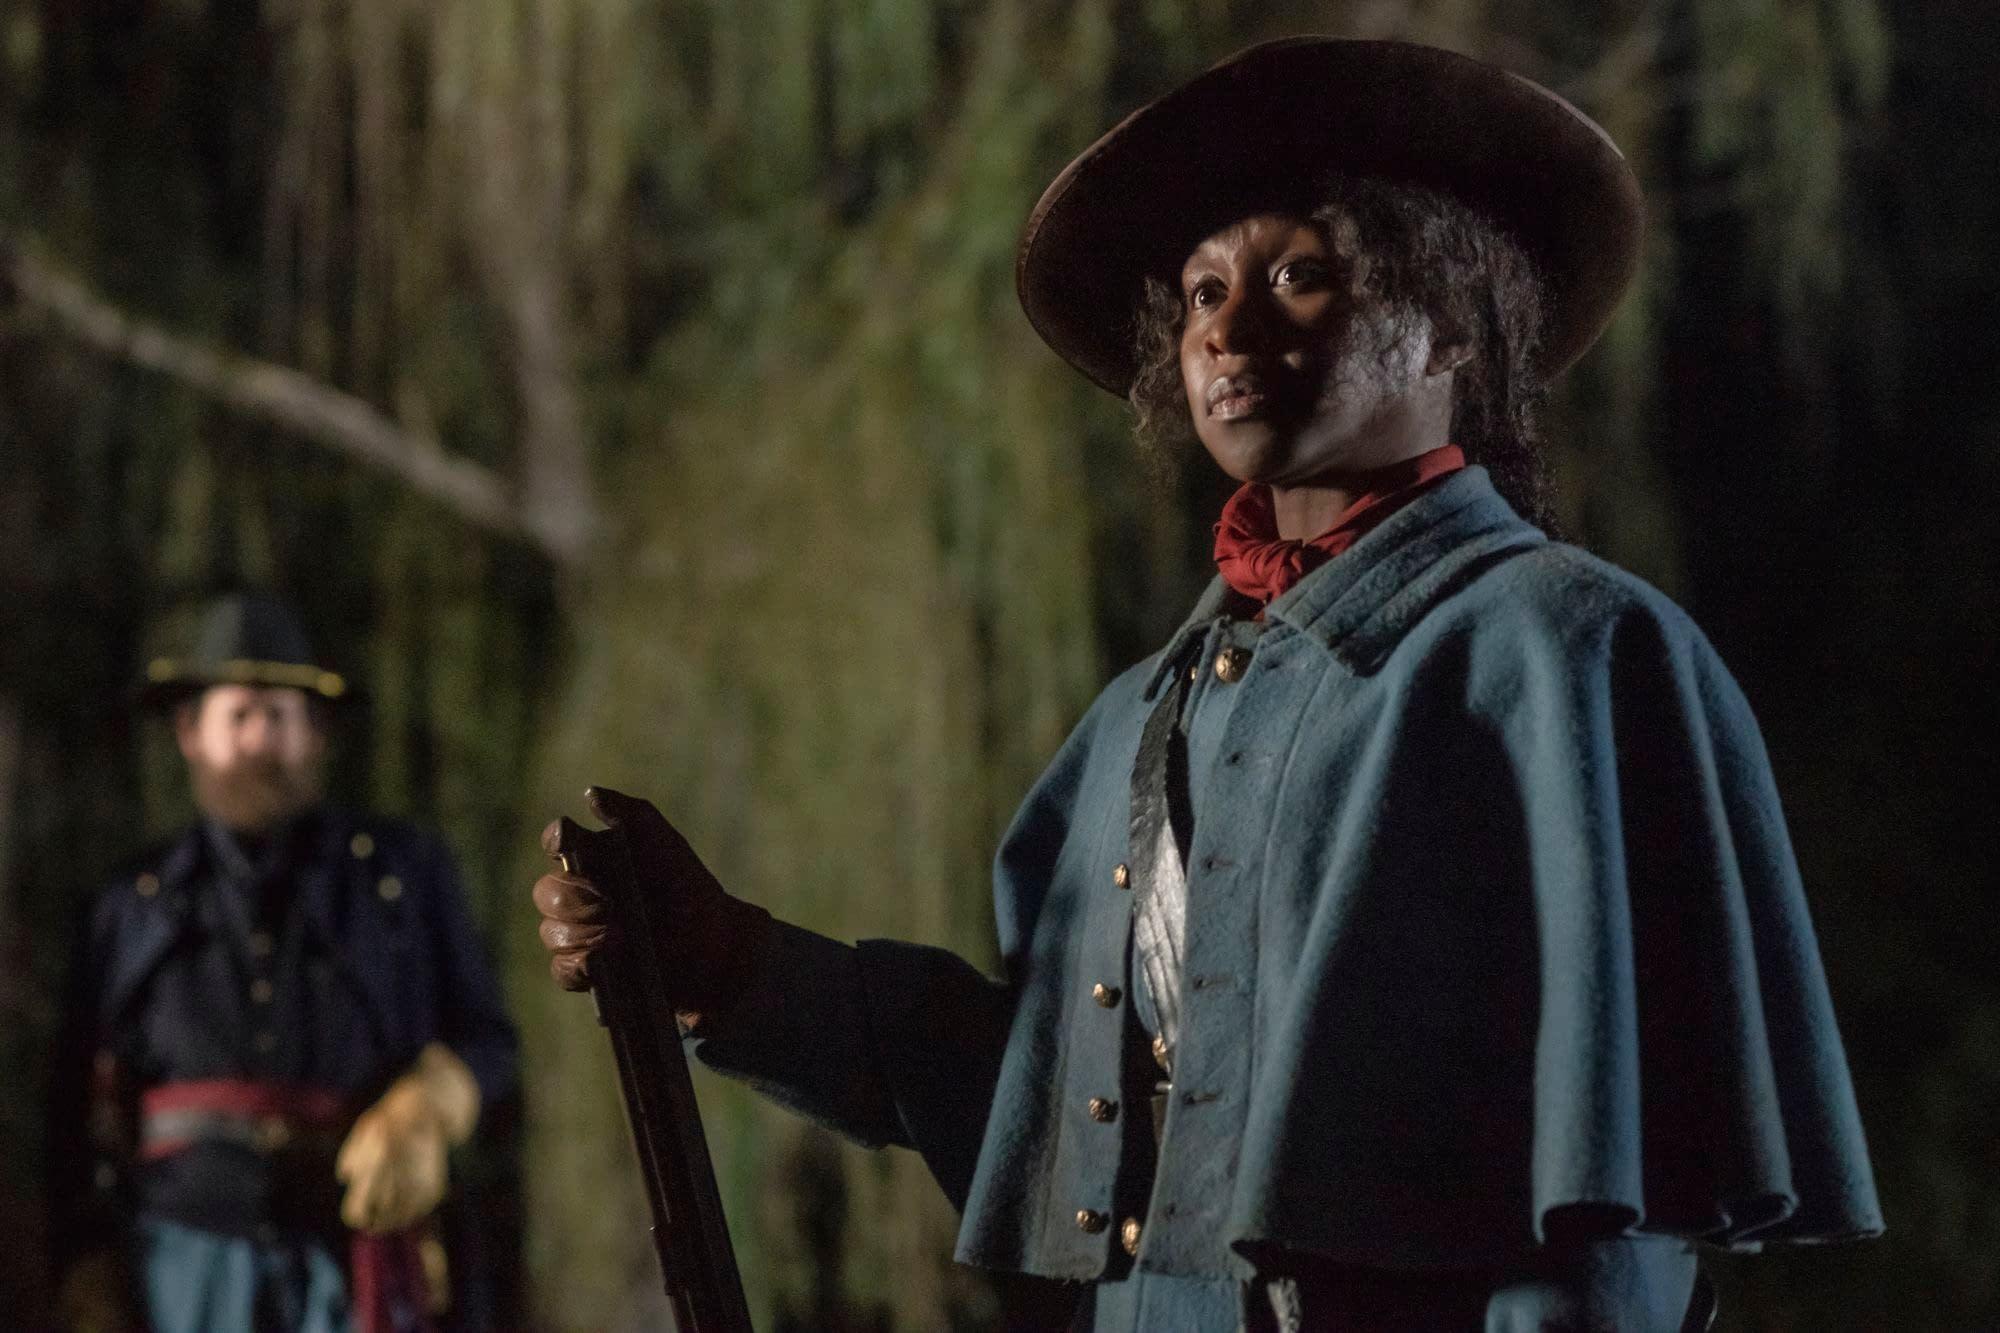 Studio excecutives wanted Julia Roberts as Harriet Tubman